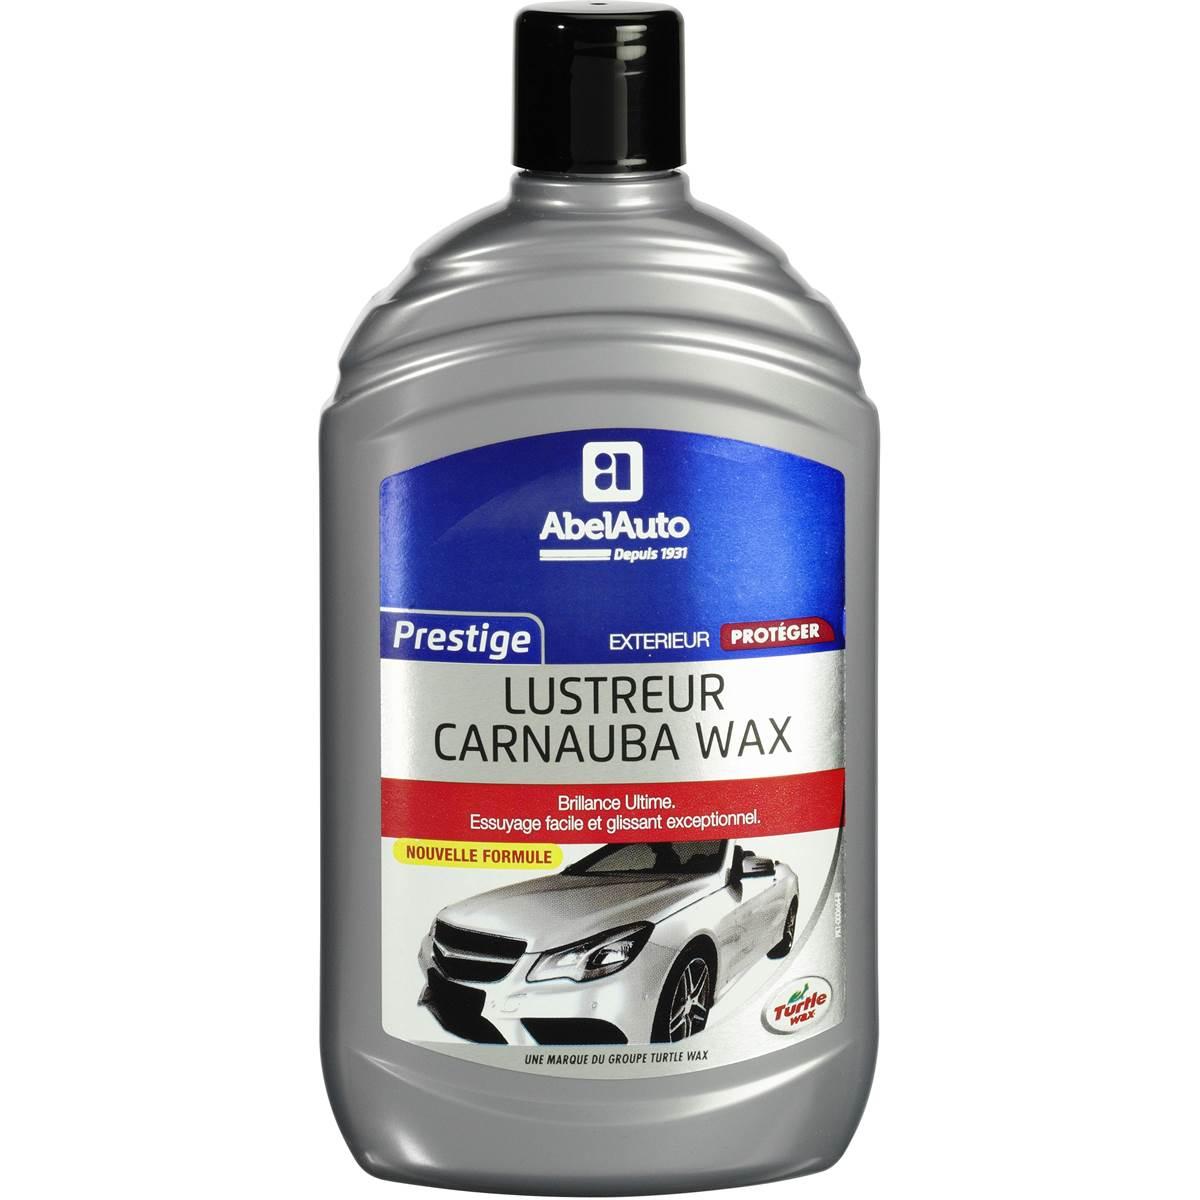 Lustreur Carnauba WAX Prestige 500ml